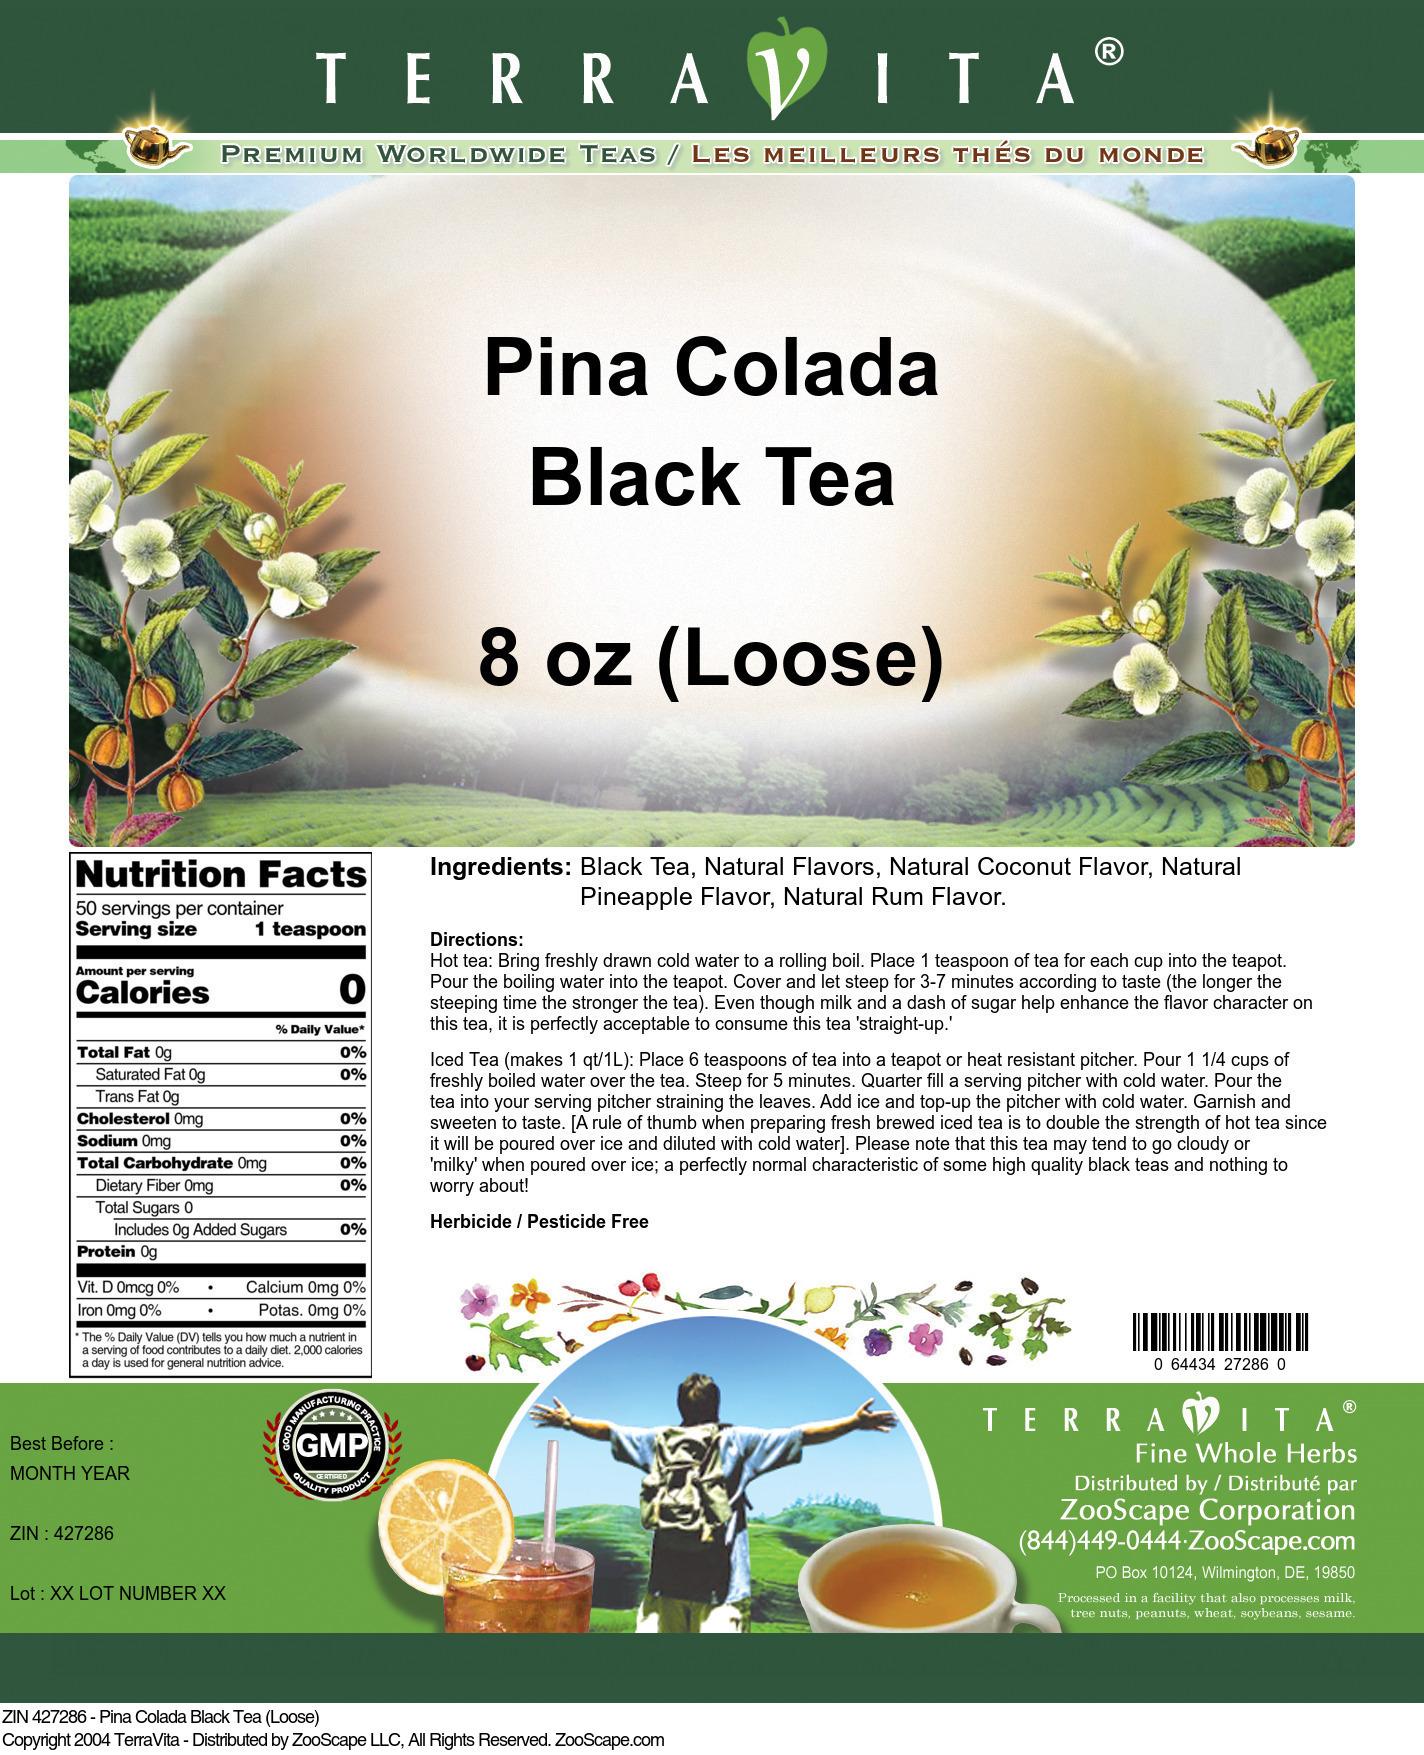 Pina Colada Black Tea (Loose)